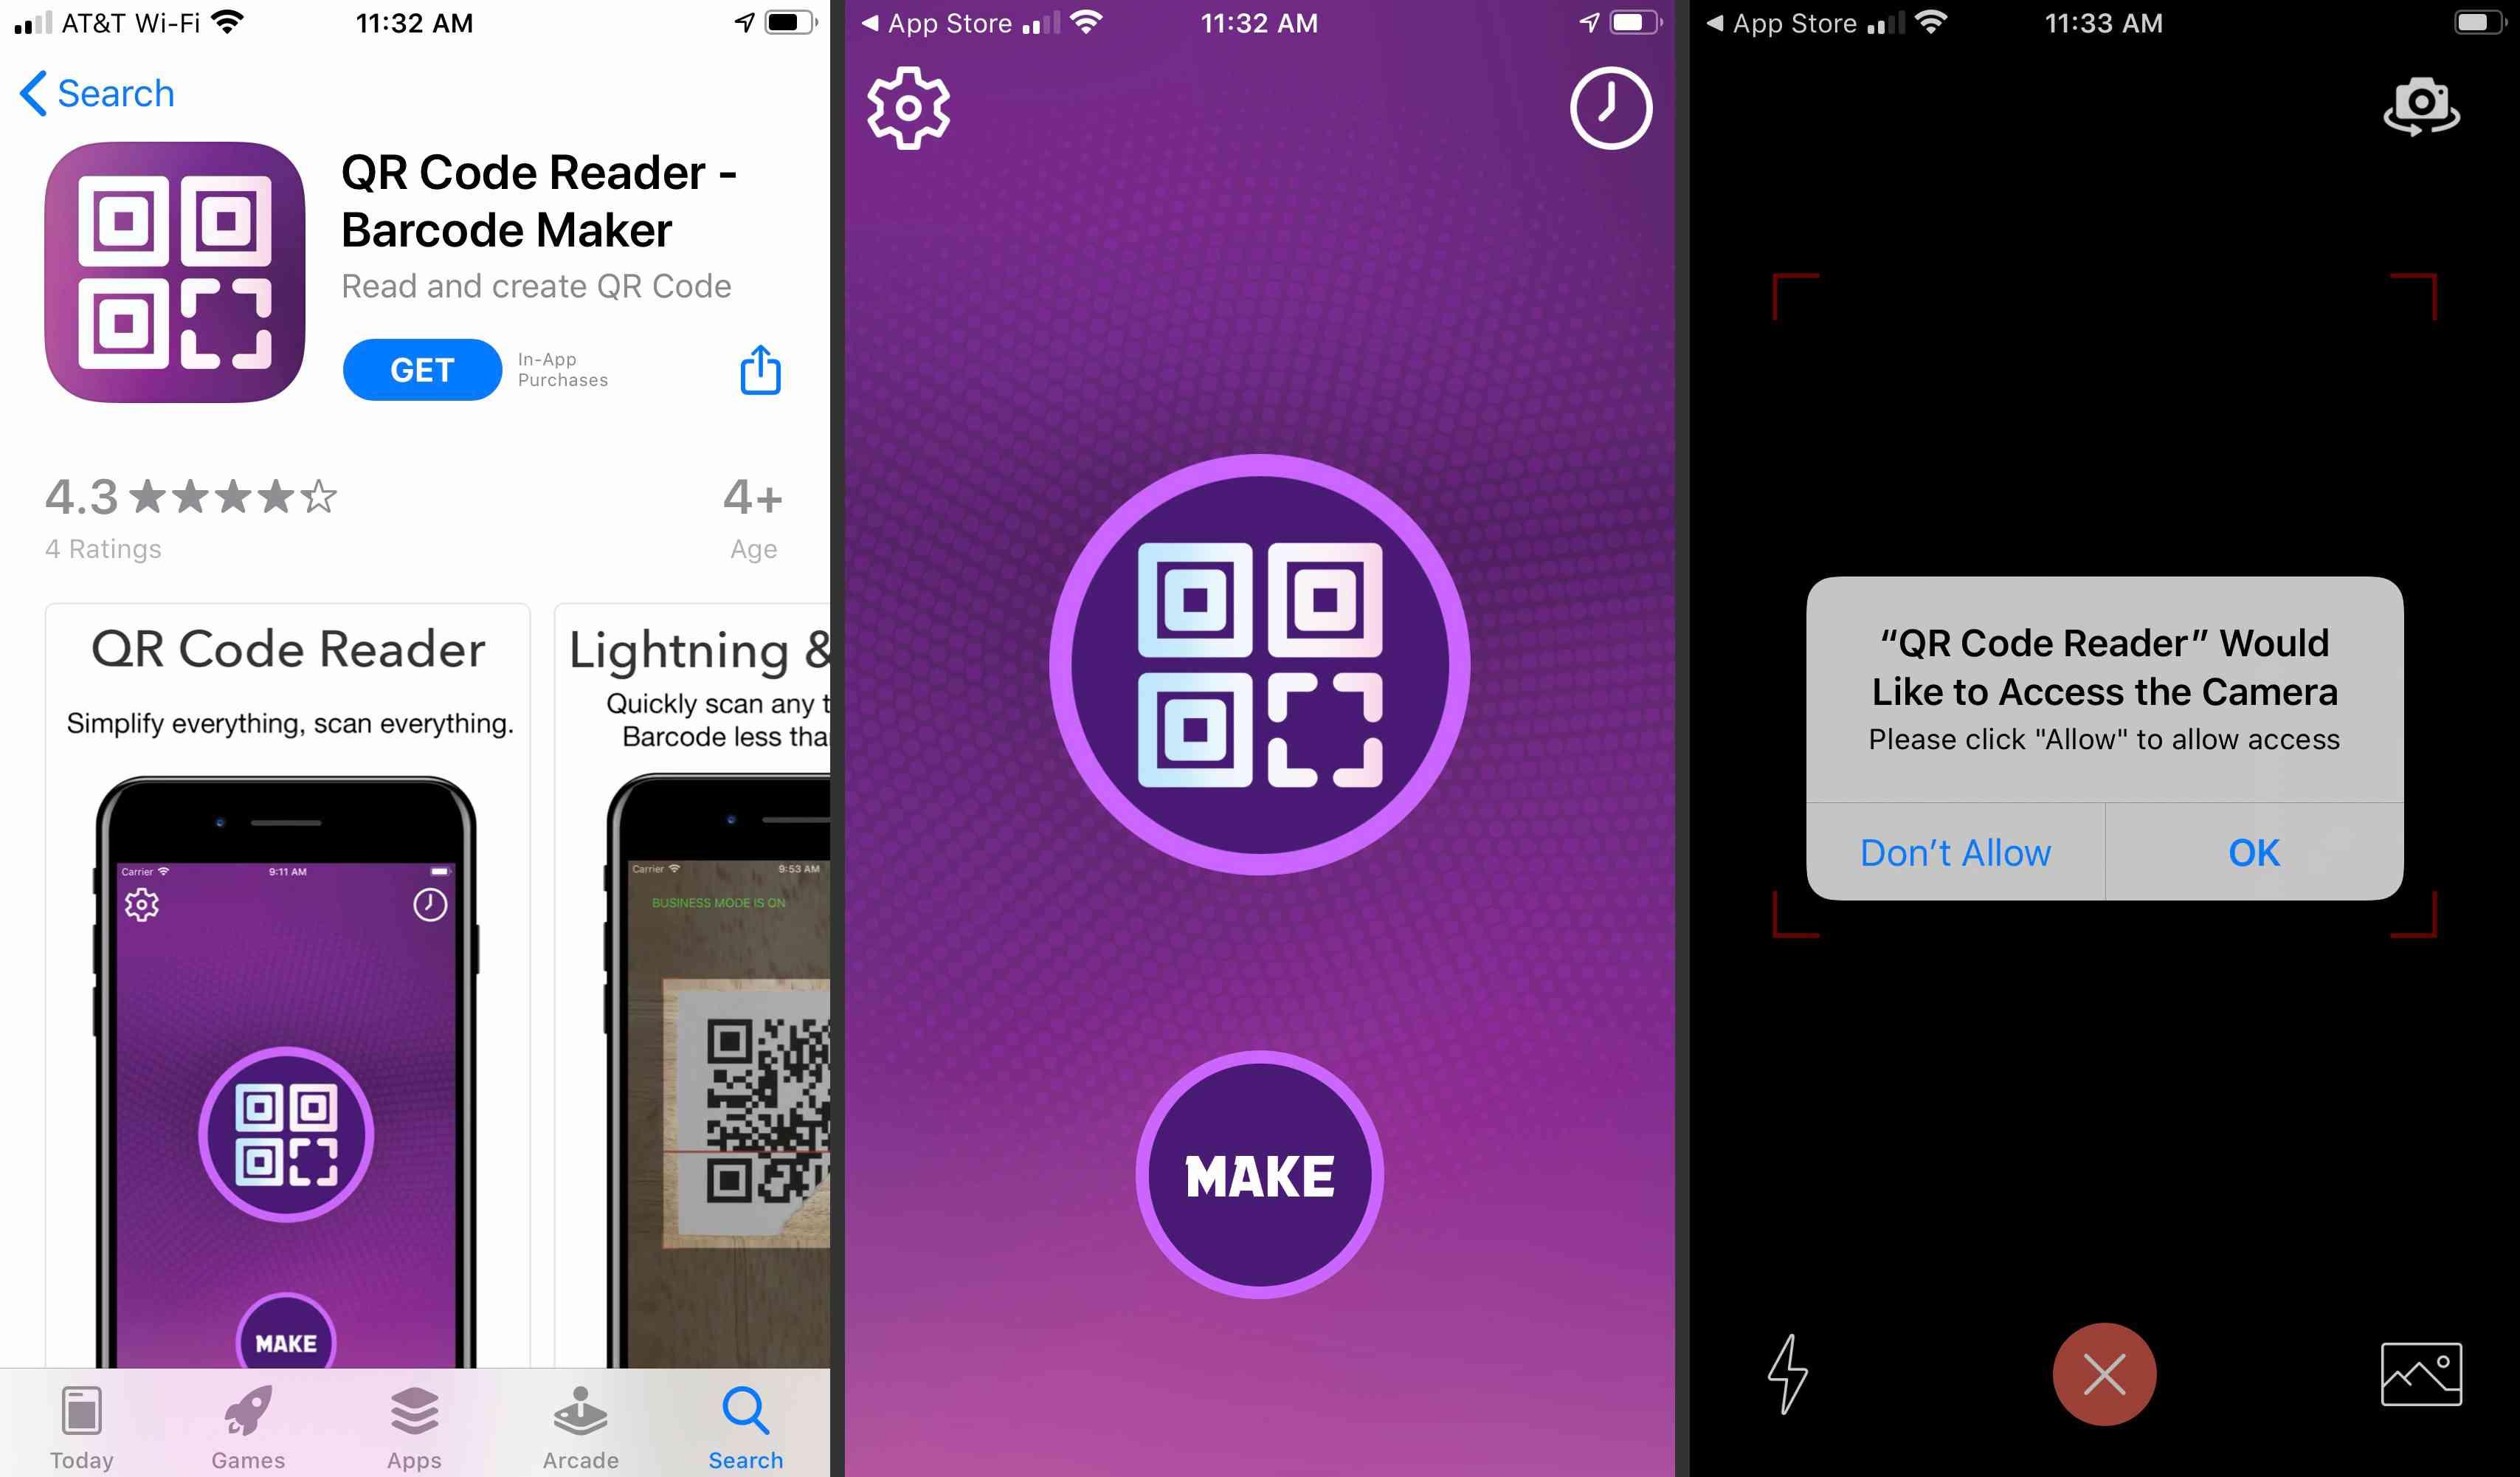 QR Code reader app accessing iOS camera